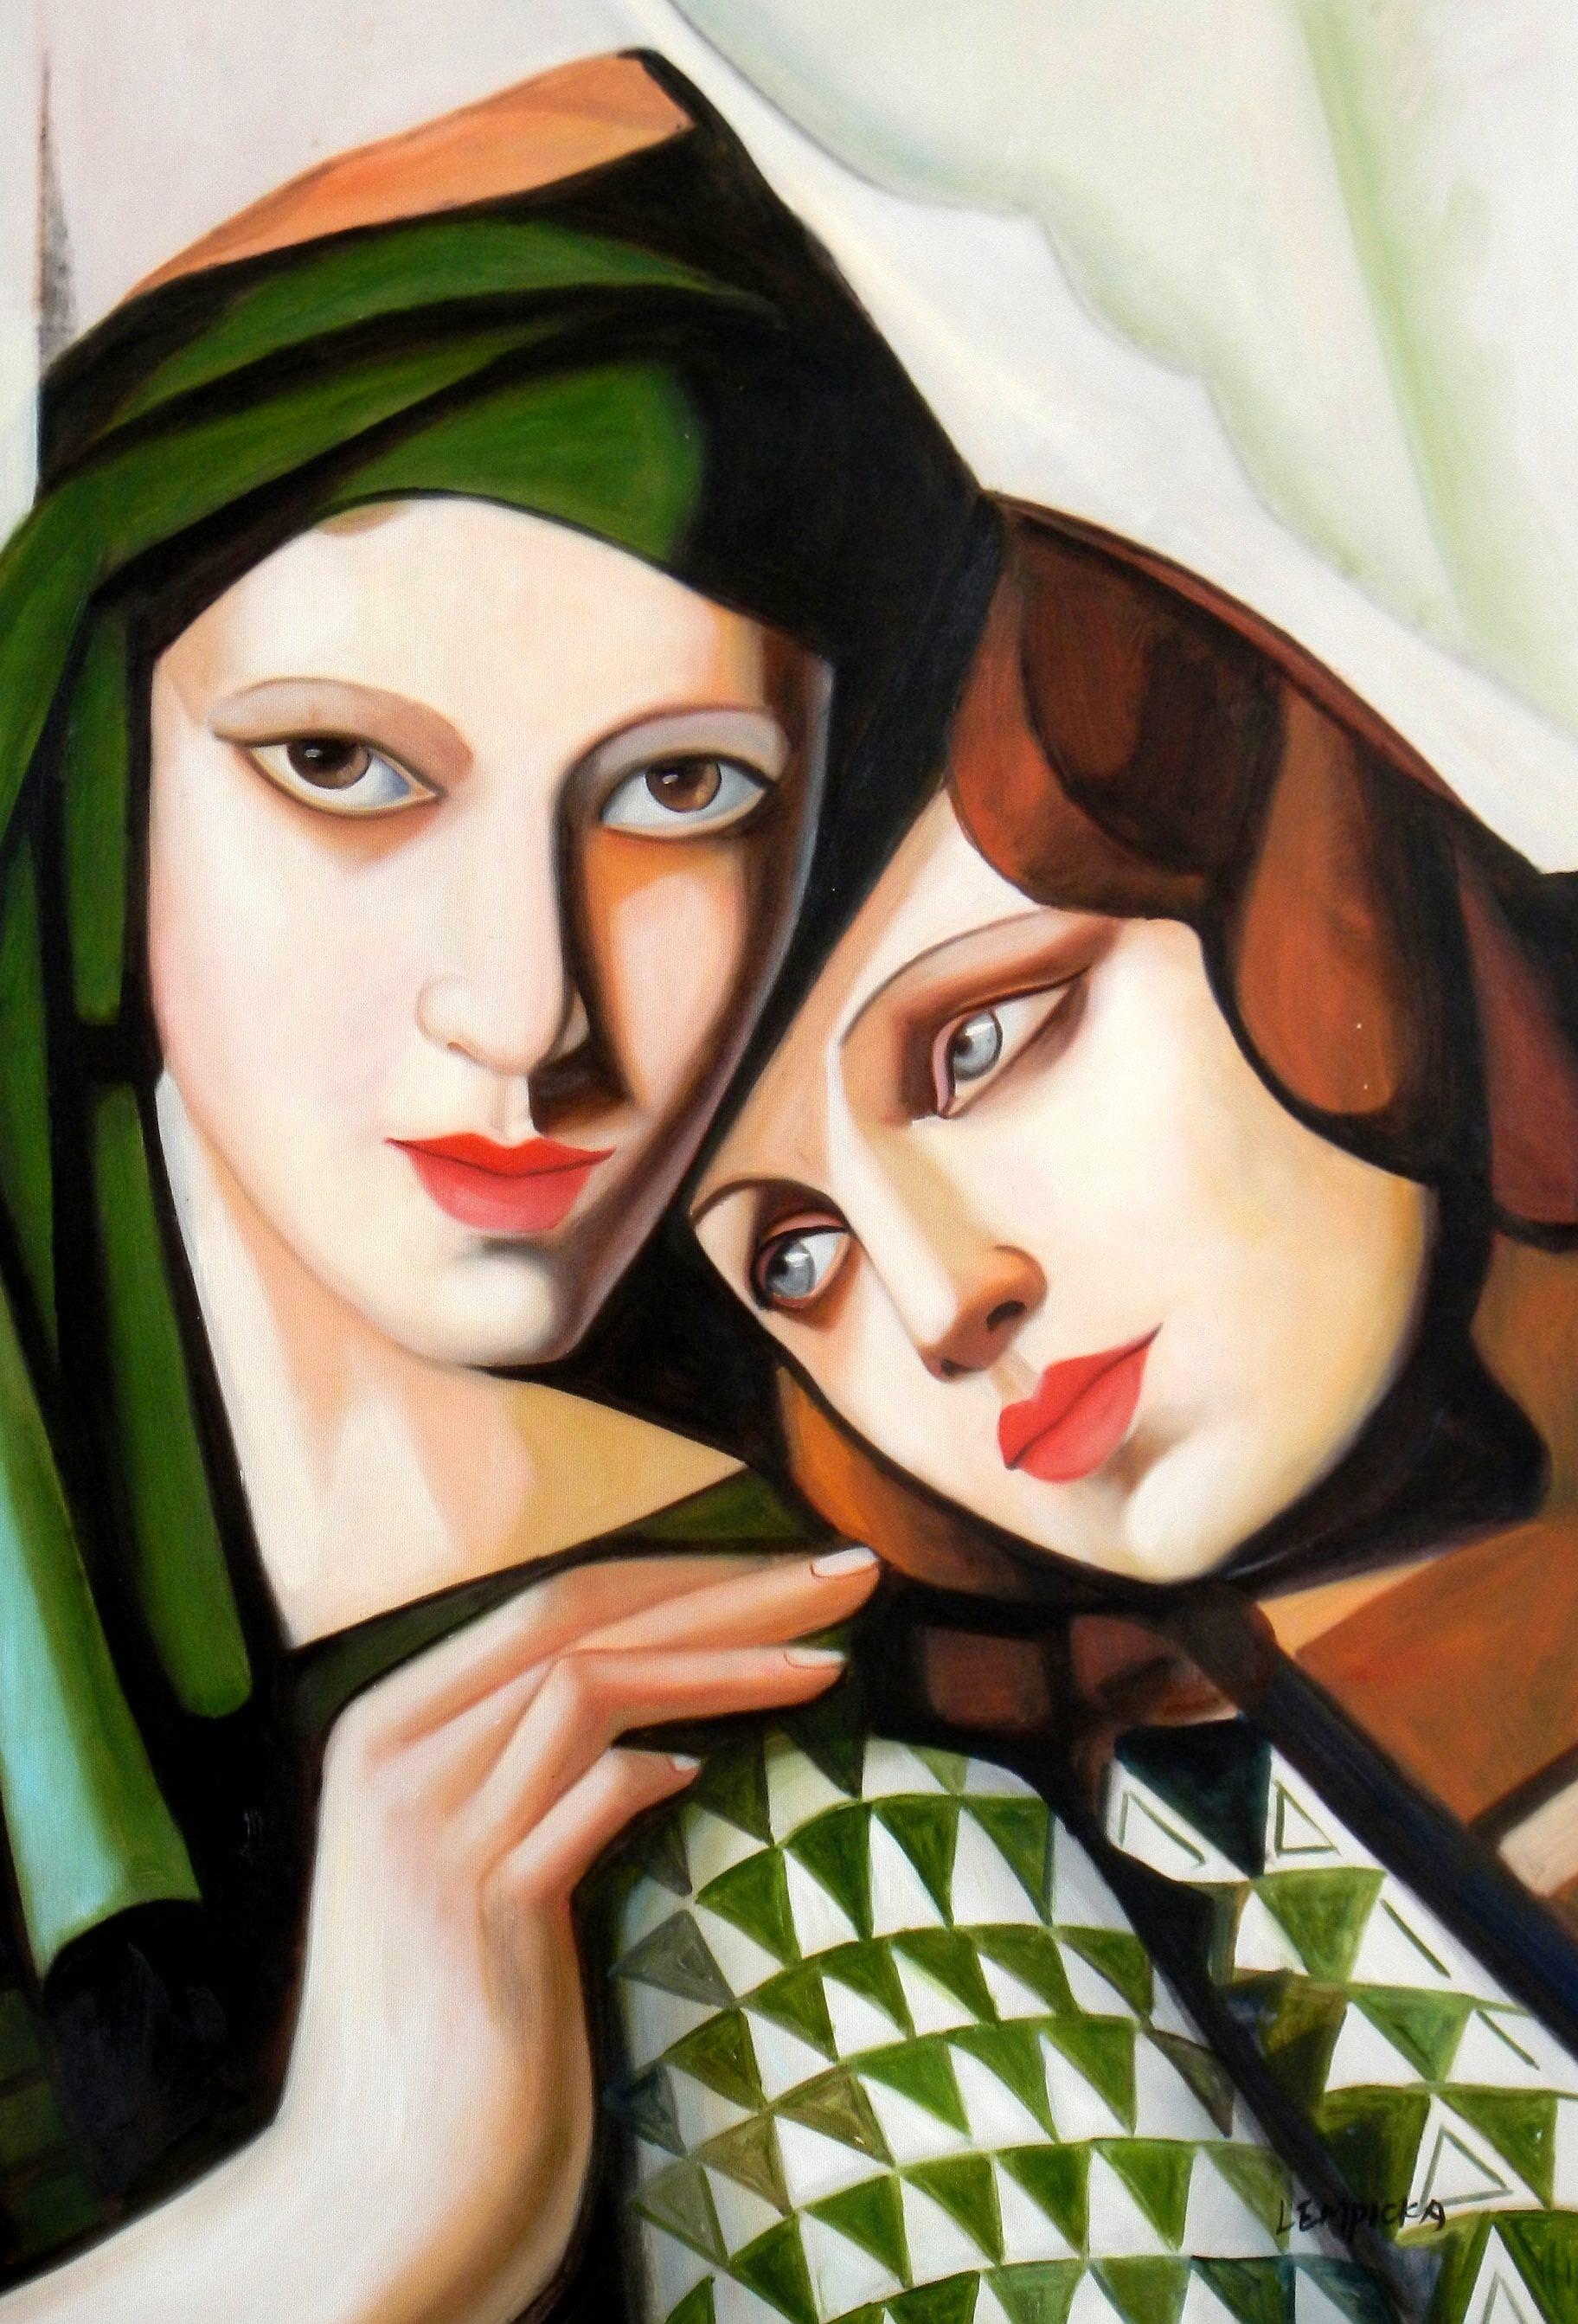 Homage of Tamara de Lempicka - Der grüne Turban d93347 60x90cm exquisites Ölbild